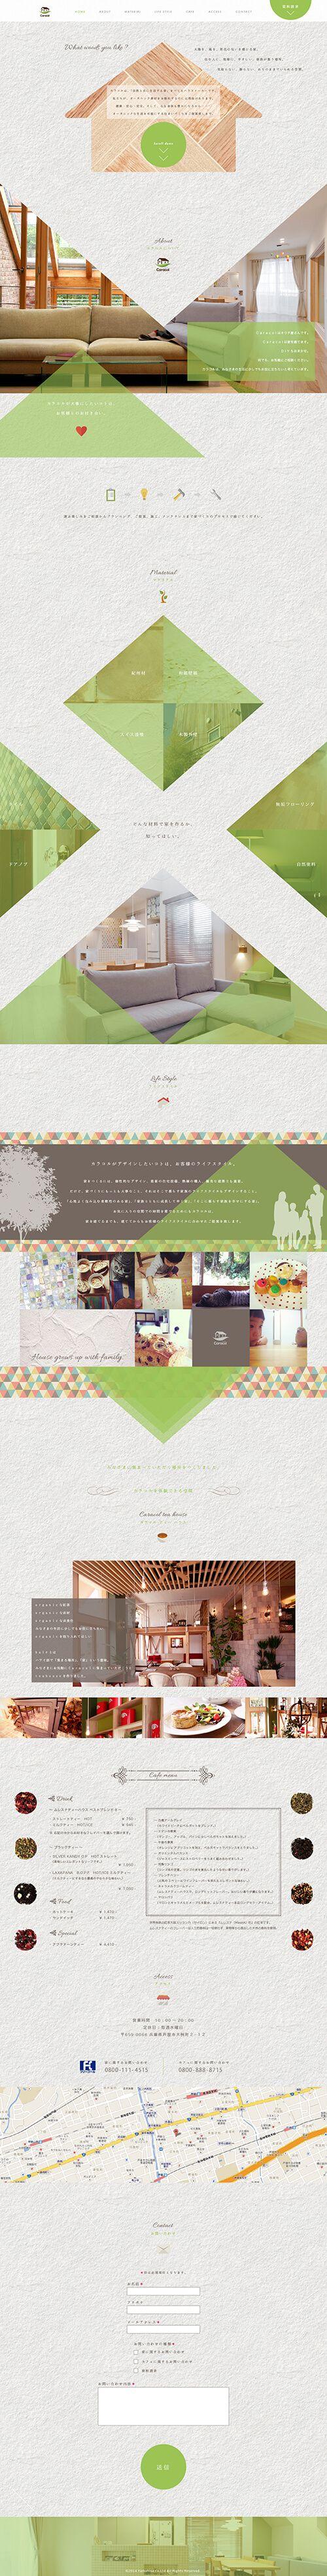 WORKS|制作実績|大阪のWEB制作会社|ブレーメン株式会社